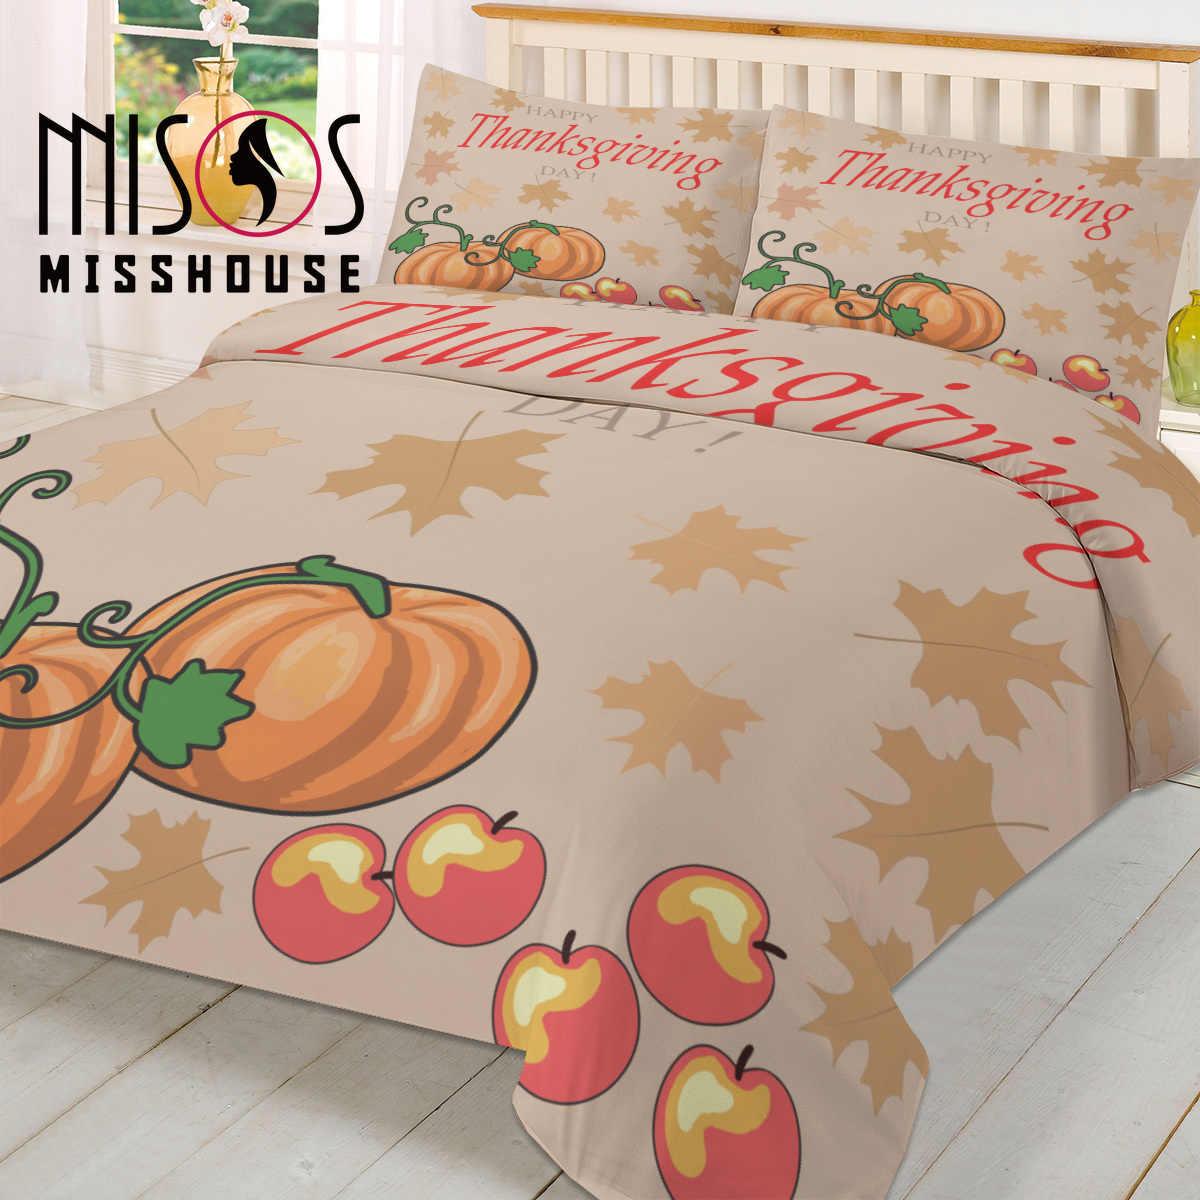 MISSHOUSE Bedding Sets Happy Thanksgiving Day Home Textile 3pcs Duvet Cover Set Comforter Cover Pillowcases